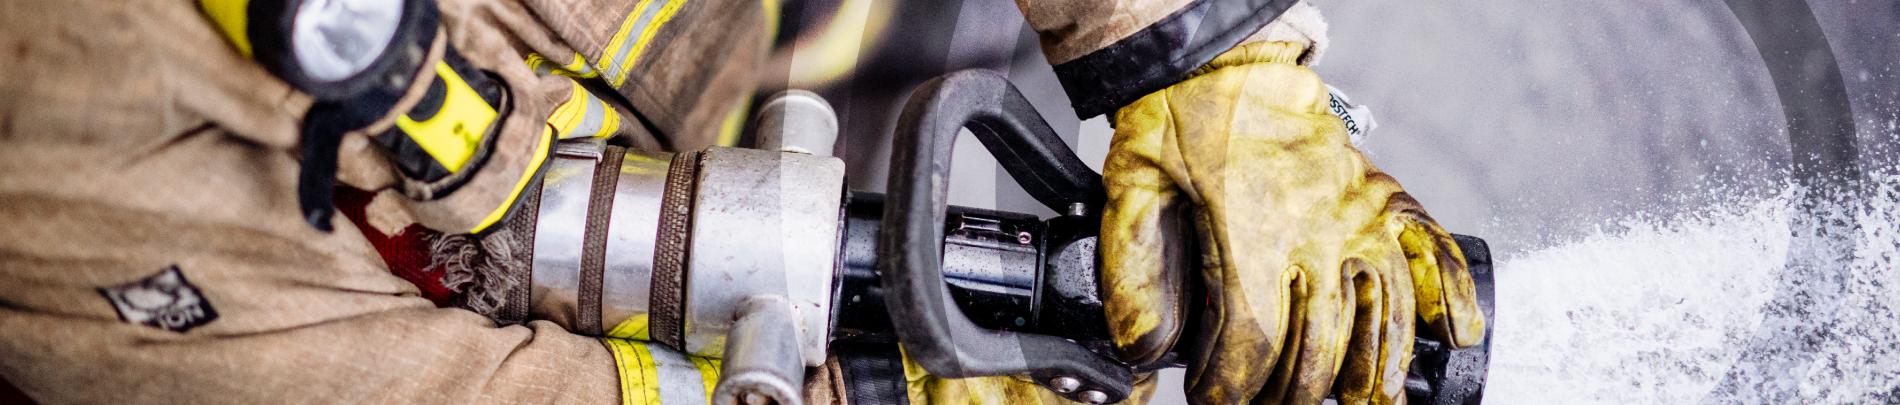 Firefighter using a hose